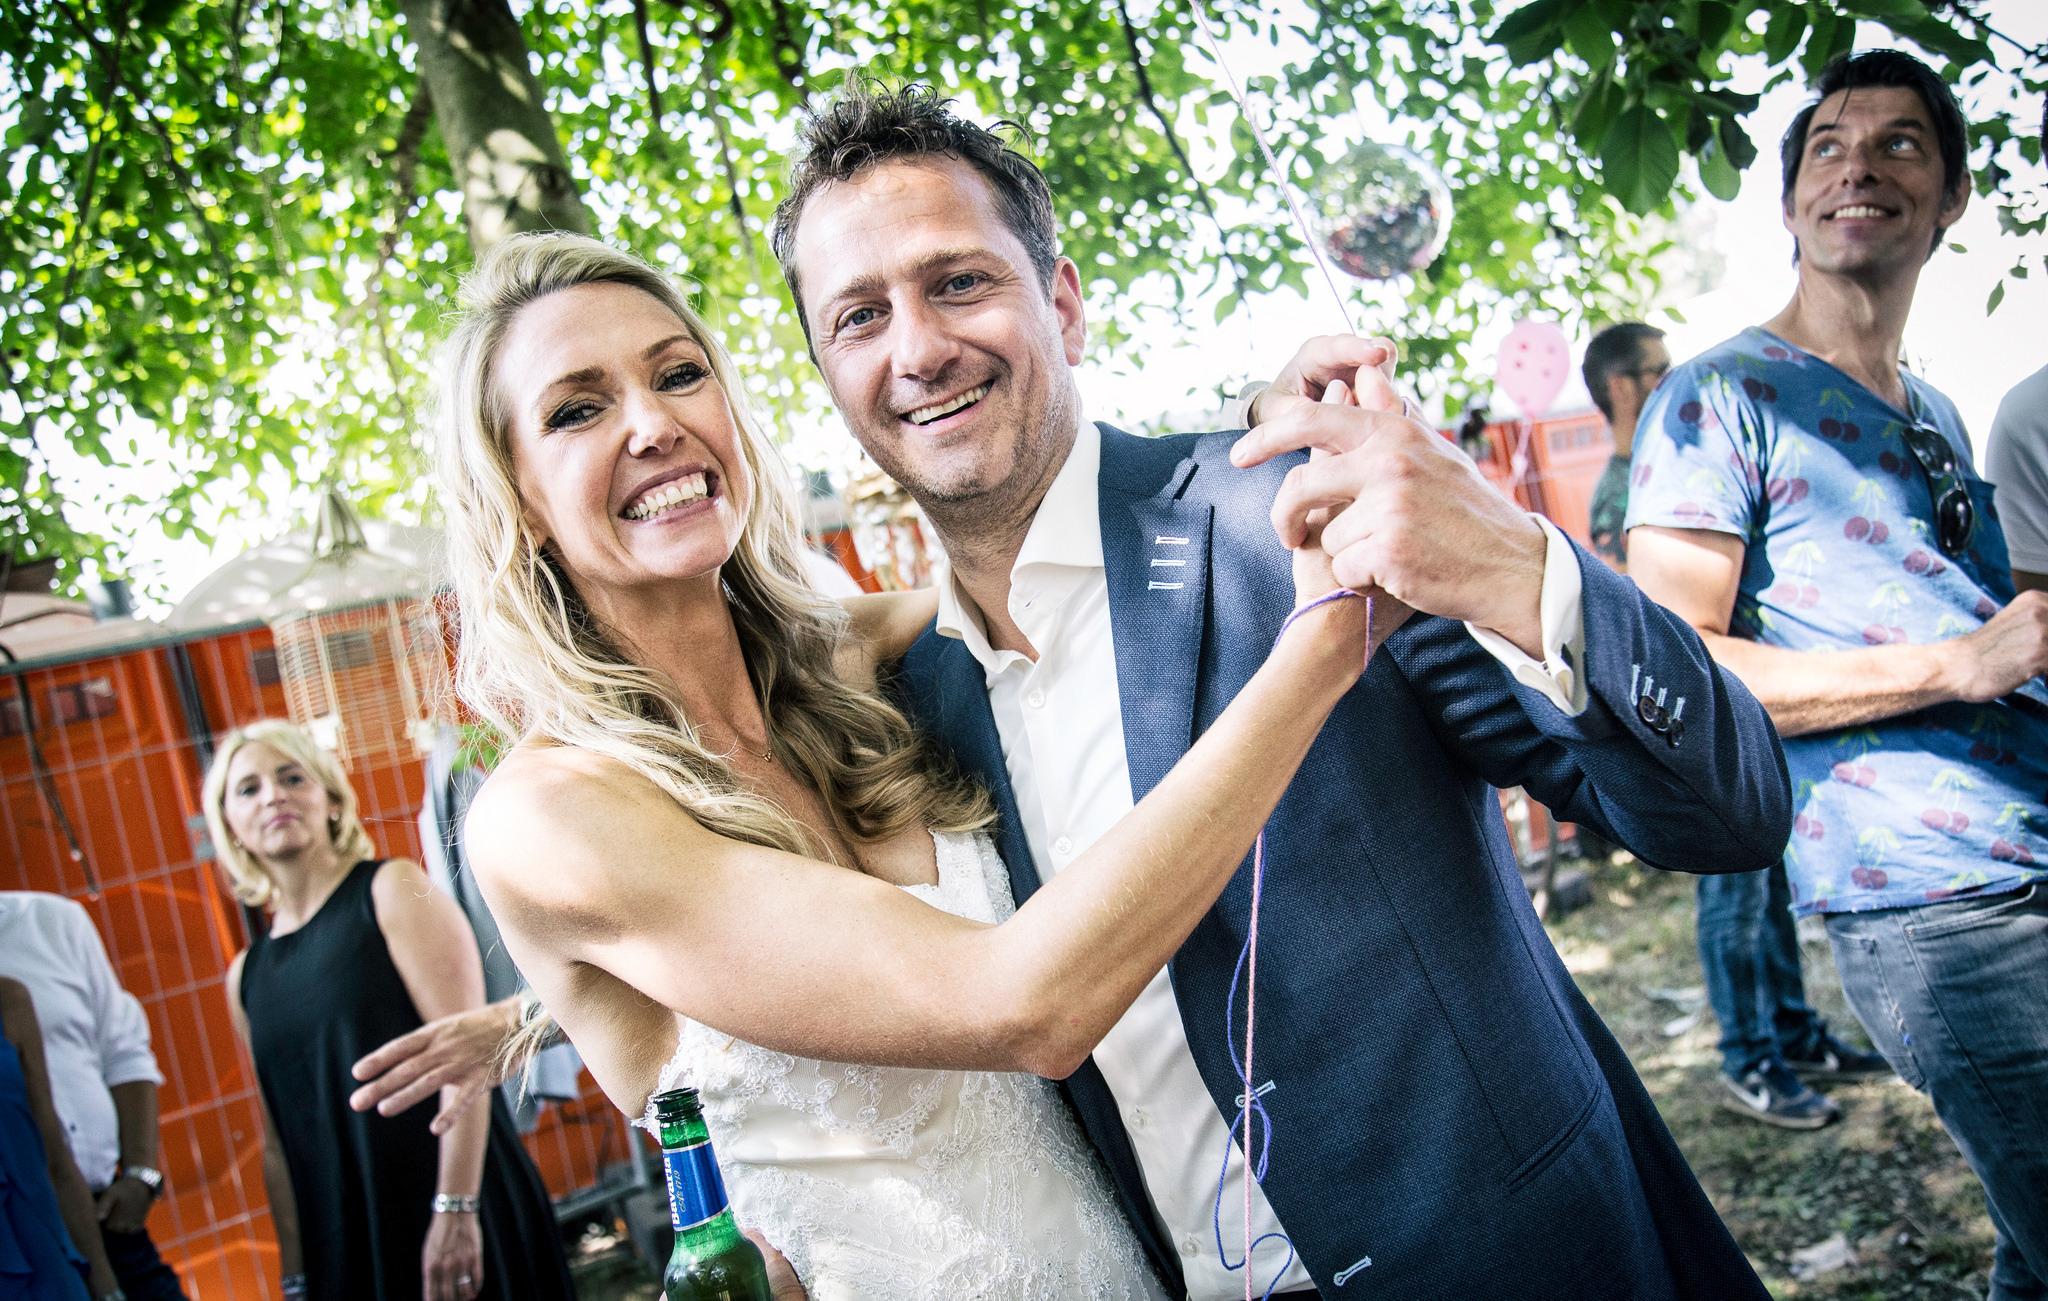 10257 solar 2016 bruiloft bruidspaar 1 foto mitchell giebels